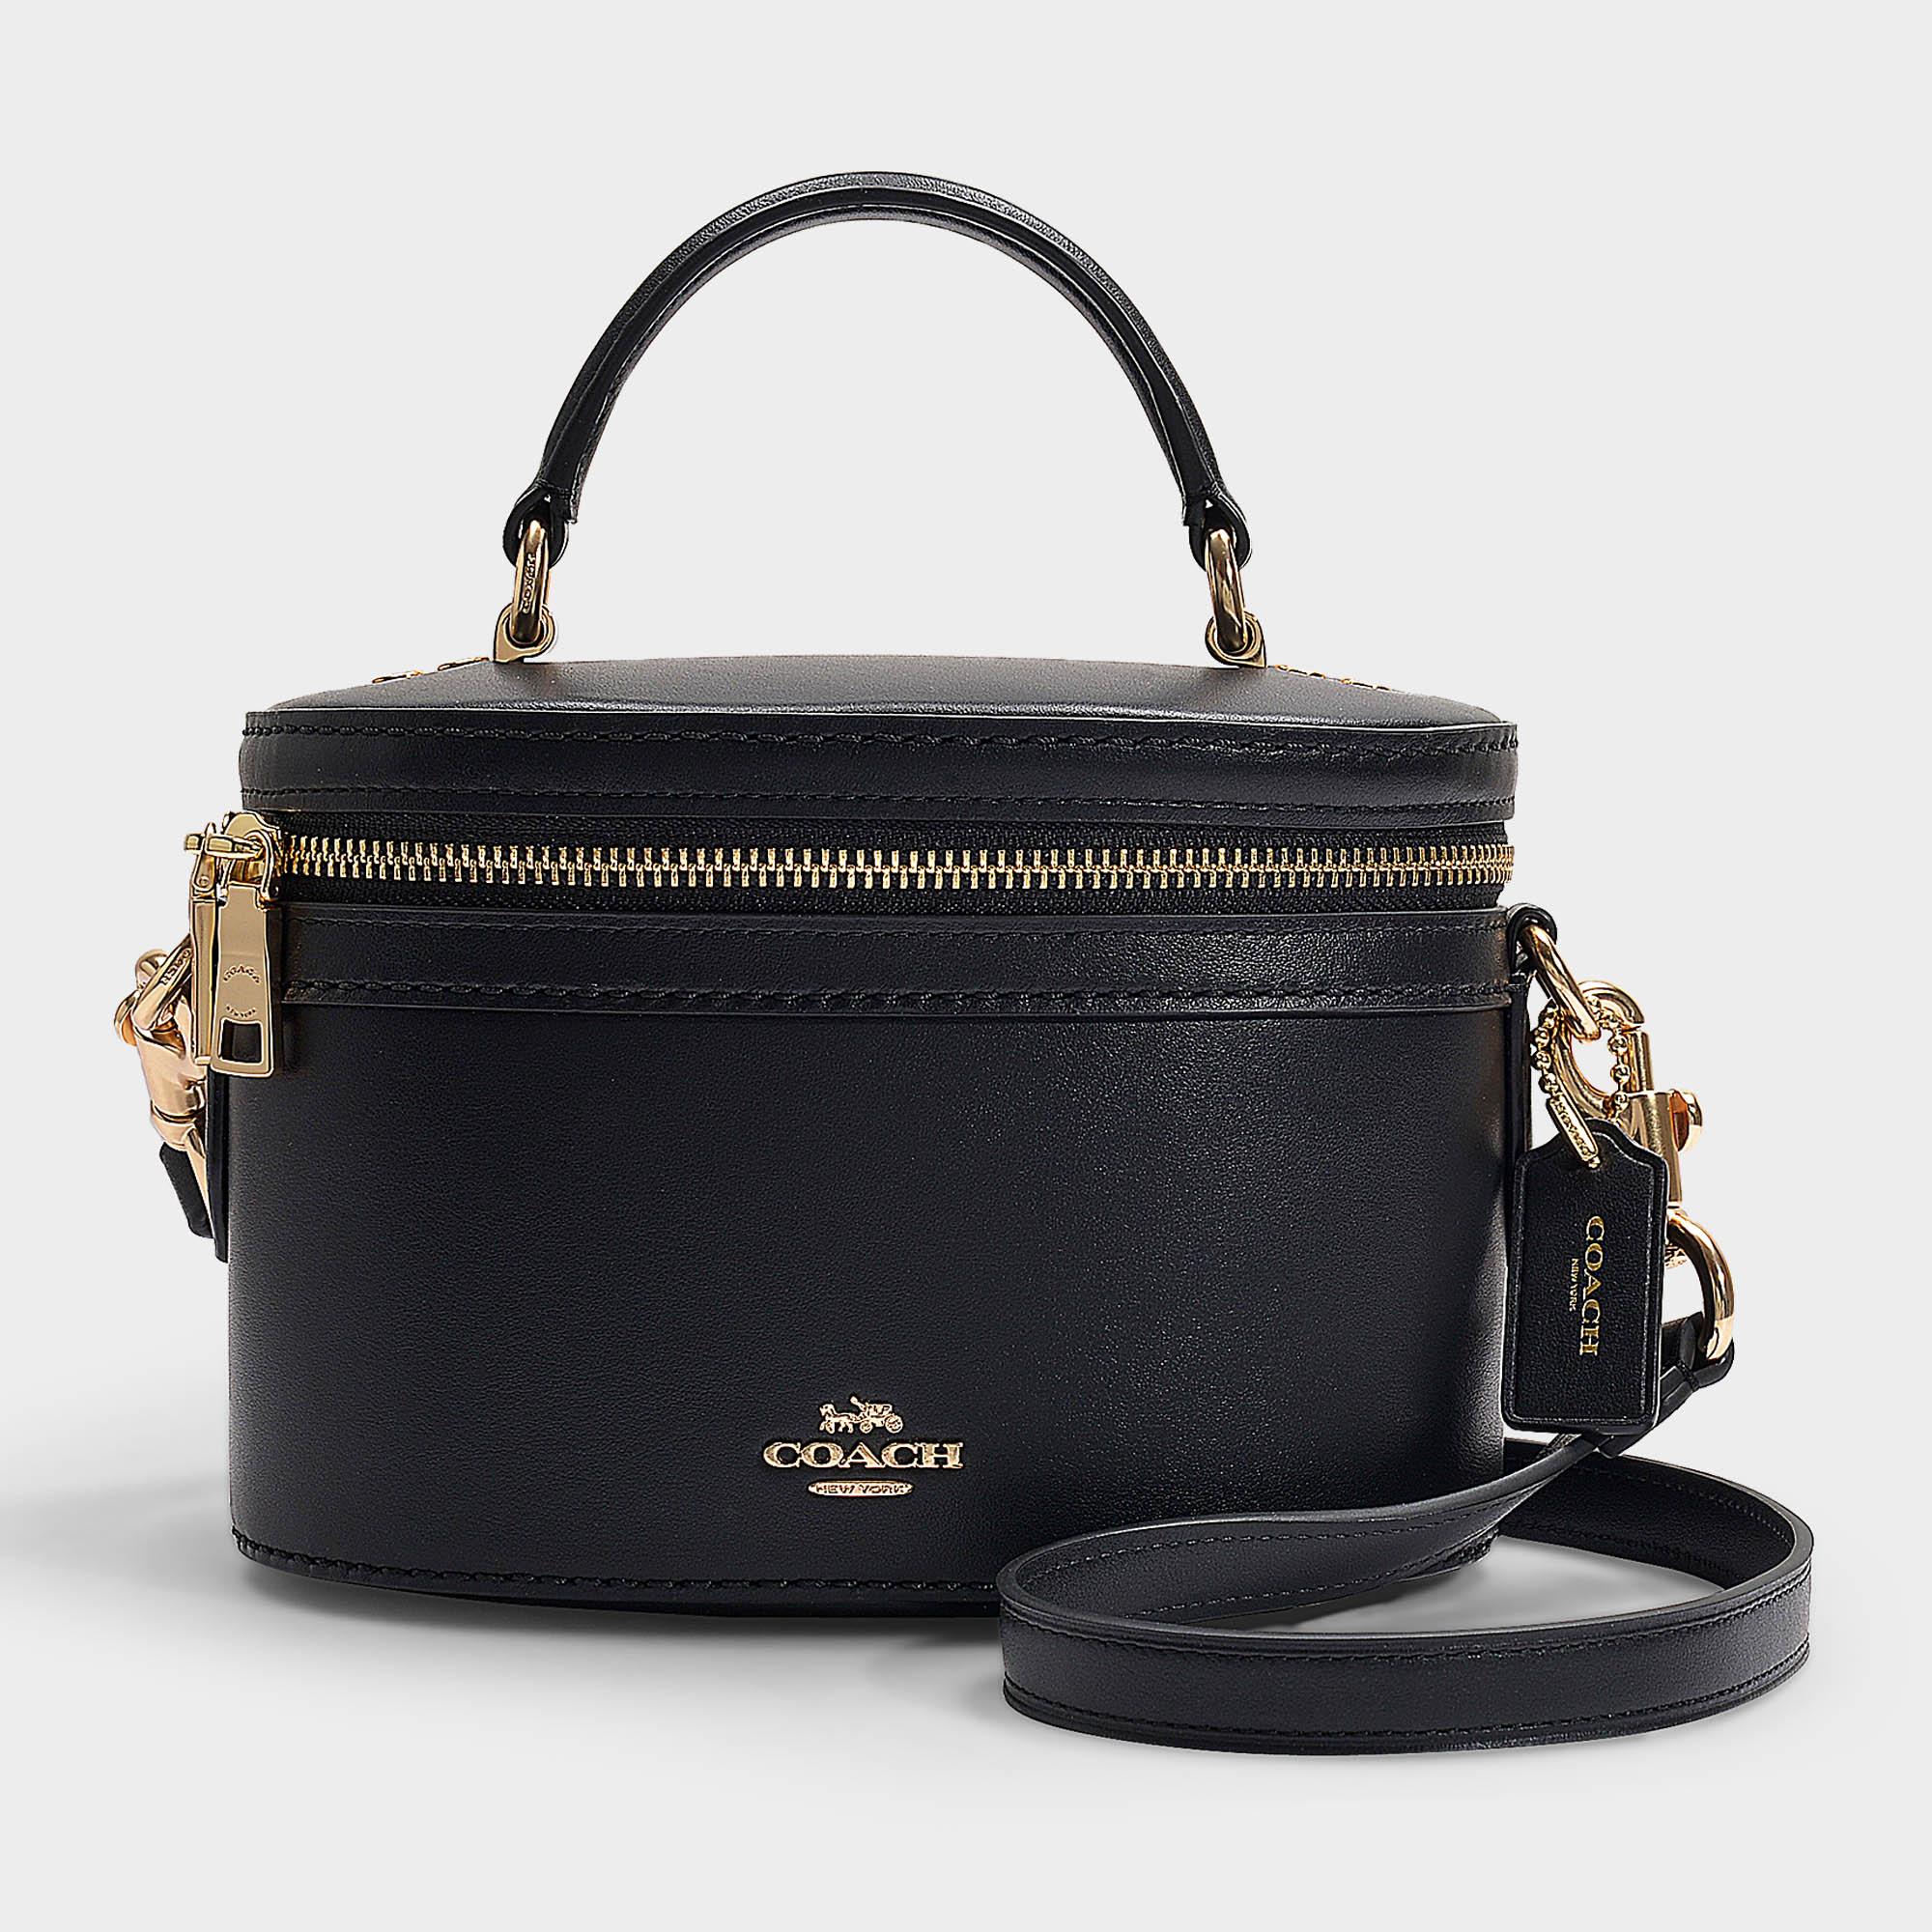 Coach Trail Crossbody Bag In Black Refined Calf Leather